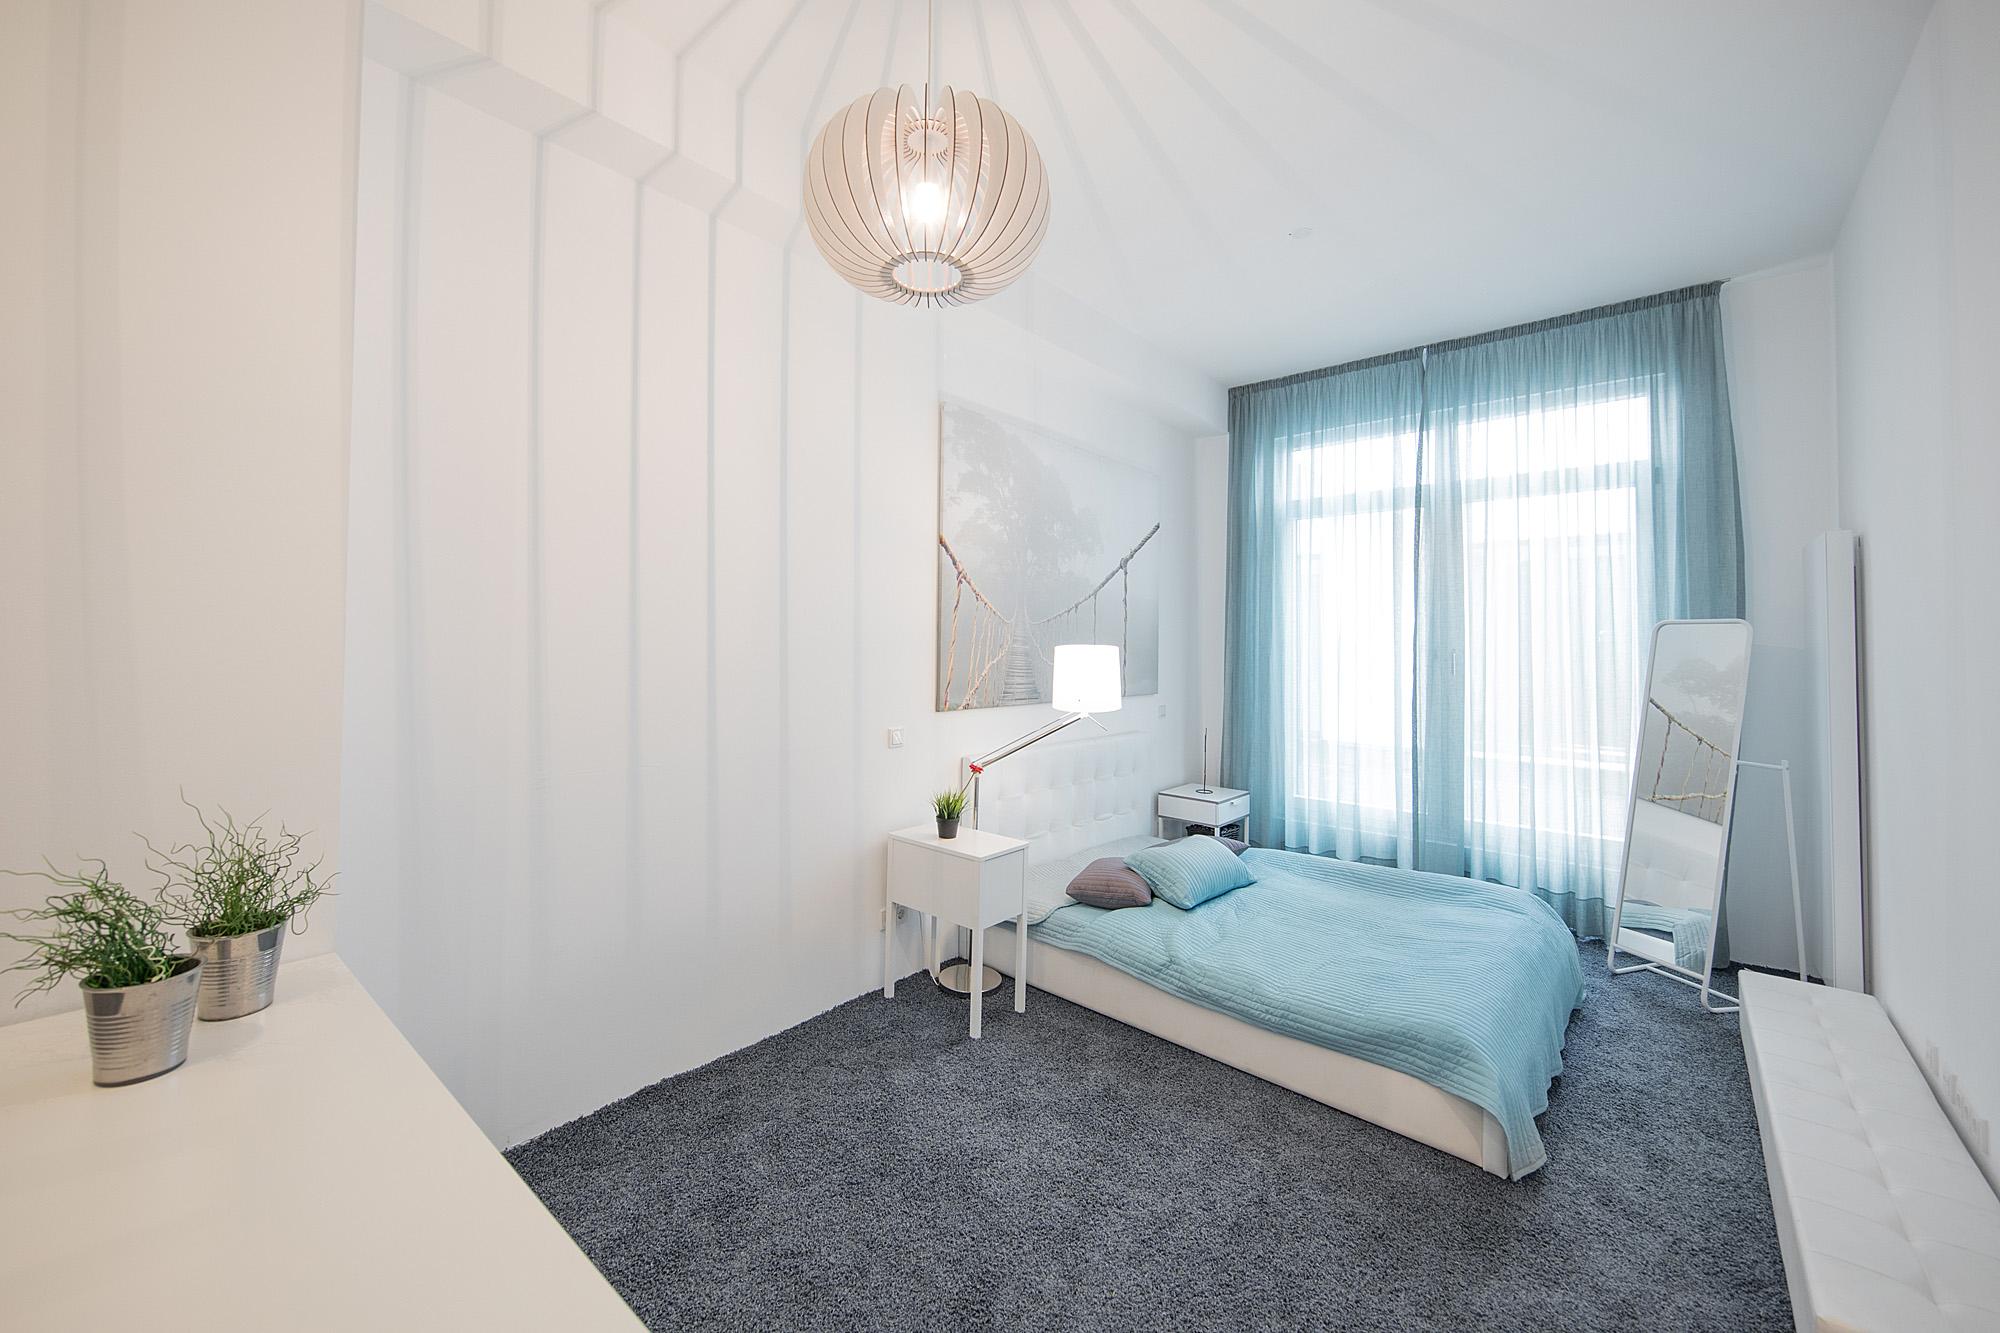 Raumausstattung Schlafzimmer | Schlafzimmer Dorfmuller Raumausstattung